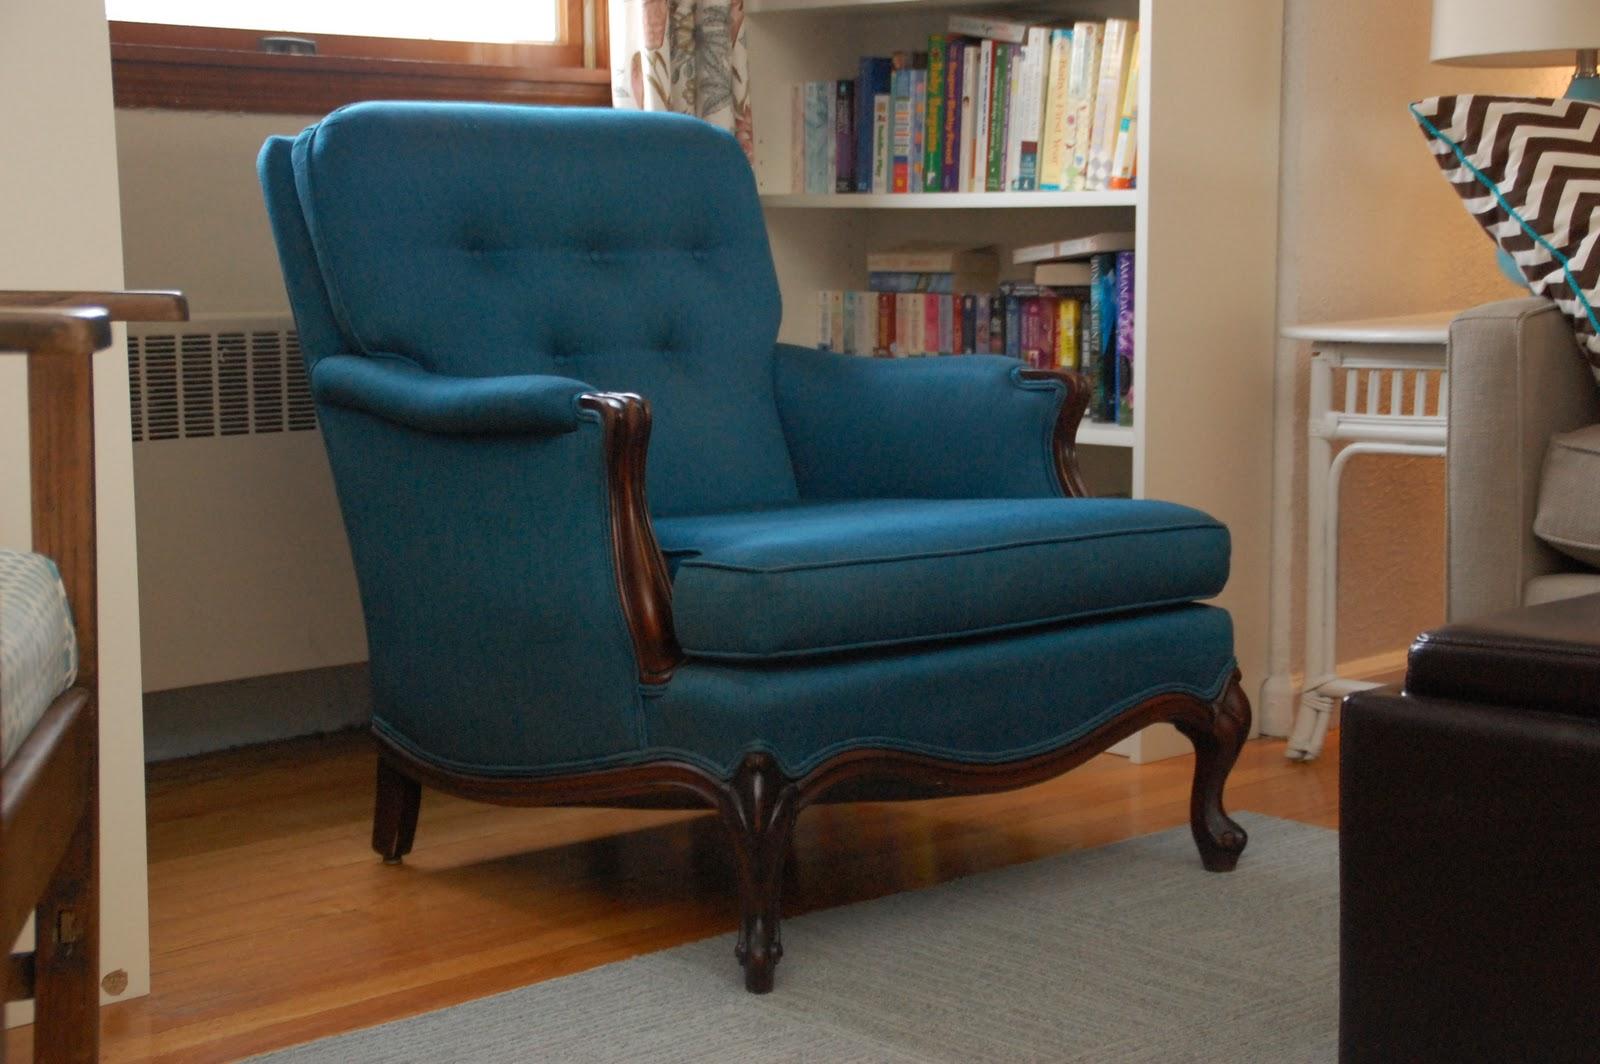 Lisa Moves Blue Craigslist Chair